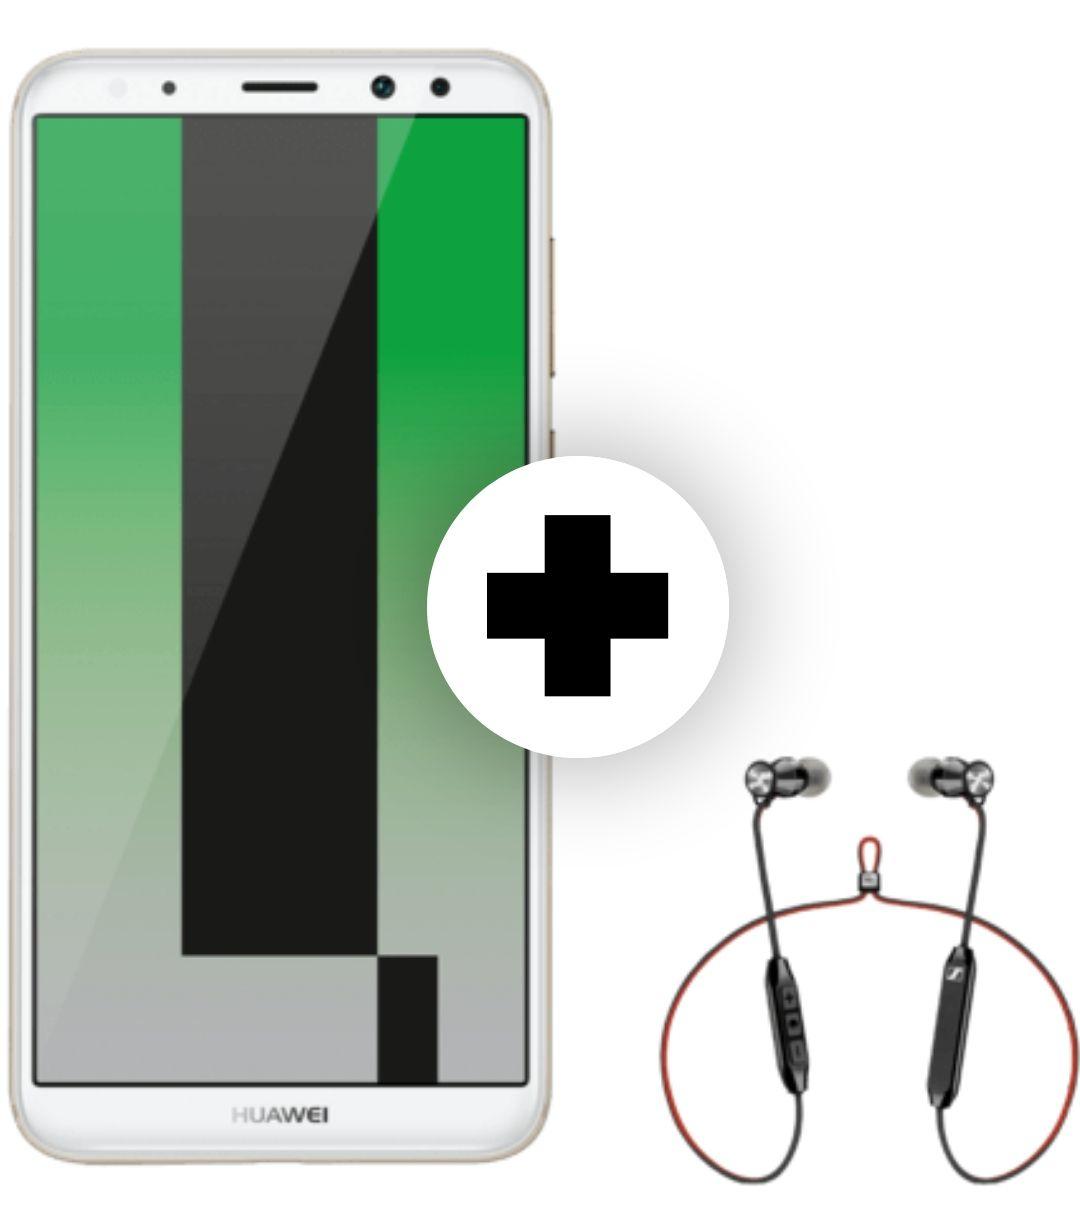 Huawei Mate 10 Lite und Sennheiser Momentum Free im Superselect (O2, 3 gb LTE), 14,99€ mtl, 34,98€ einmalig